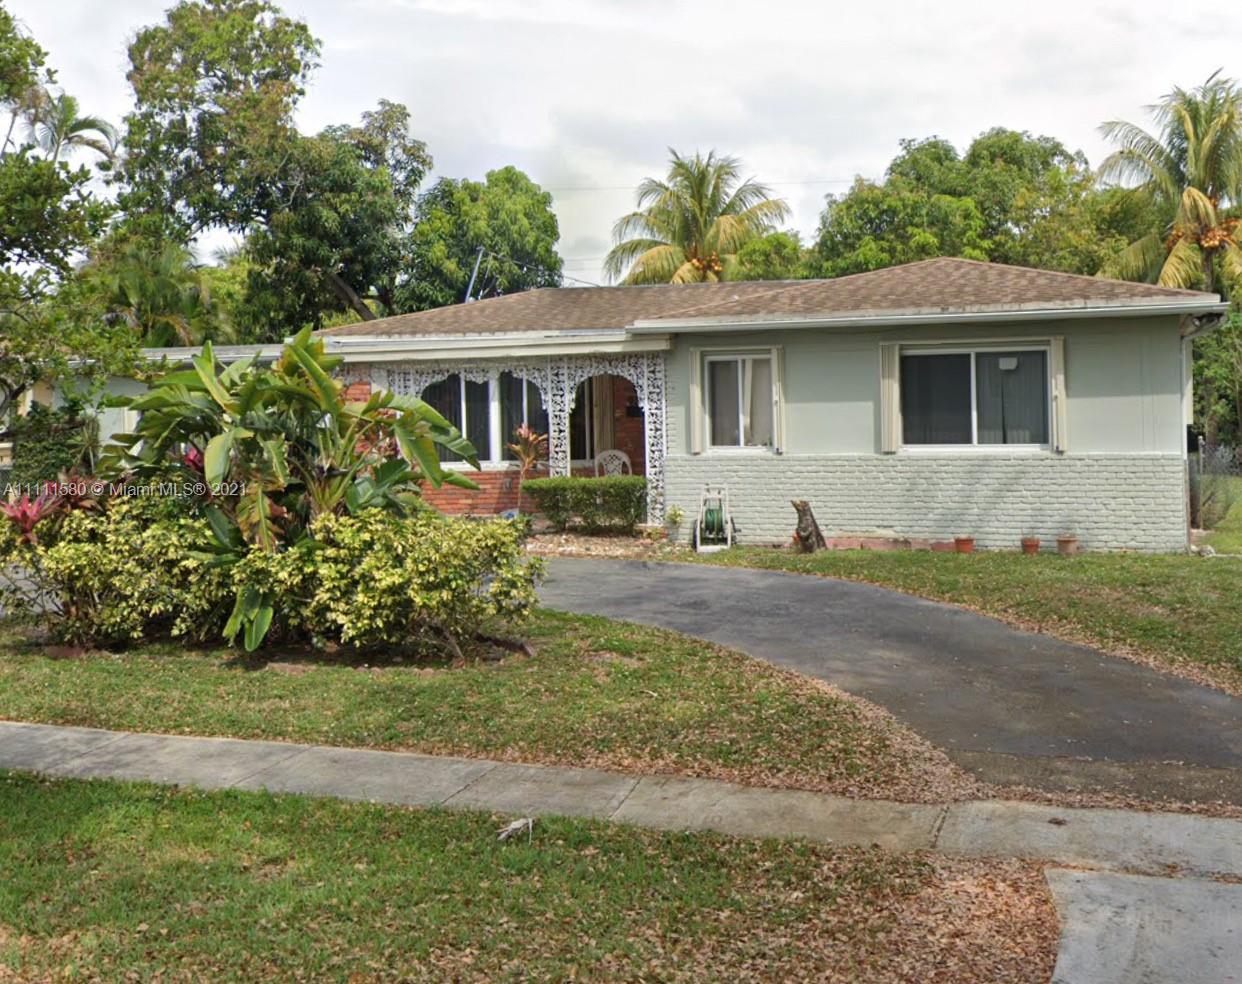 Single Family Home,For Sale,95 NE 131st St, North Miami, Florida 33161,Brickell,realty,broker,condos near me